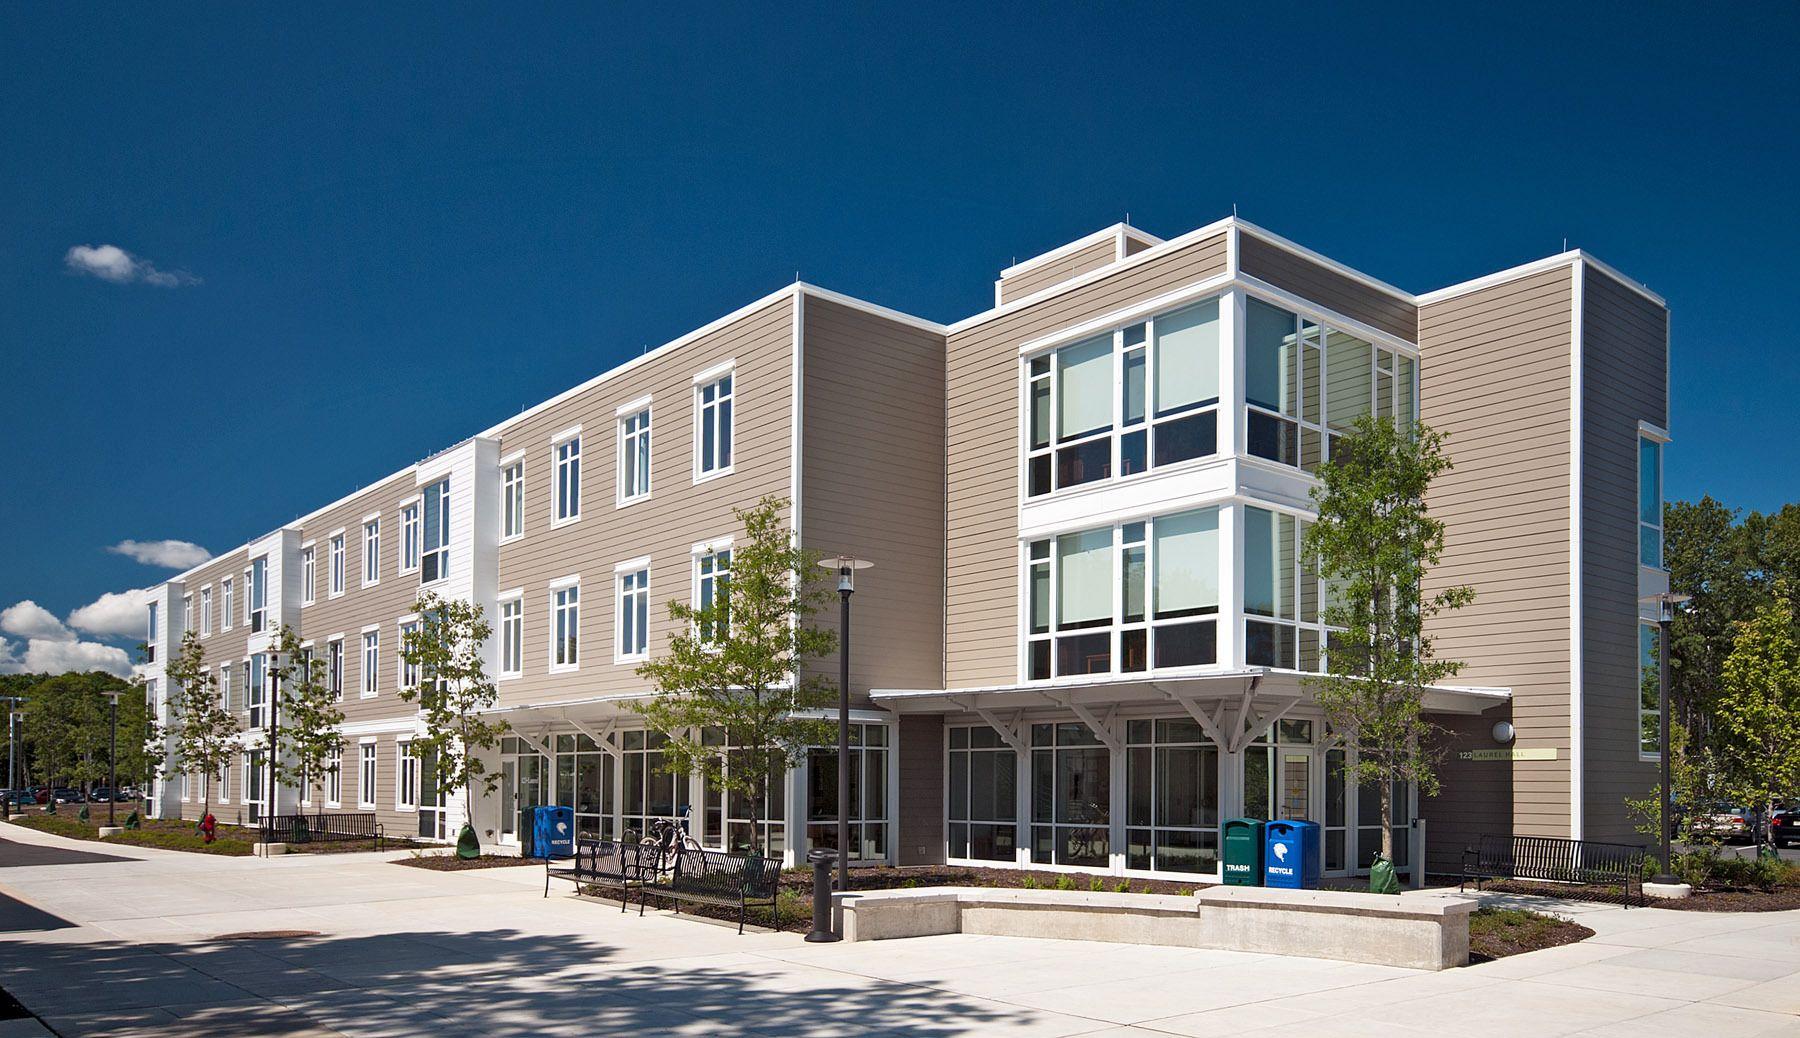 Housing 5,  Richard Stockton College of New Jersey, Galloway, NJ